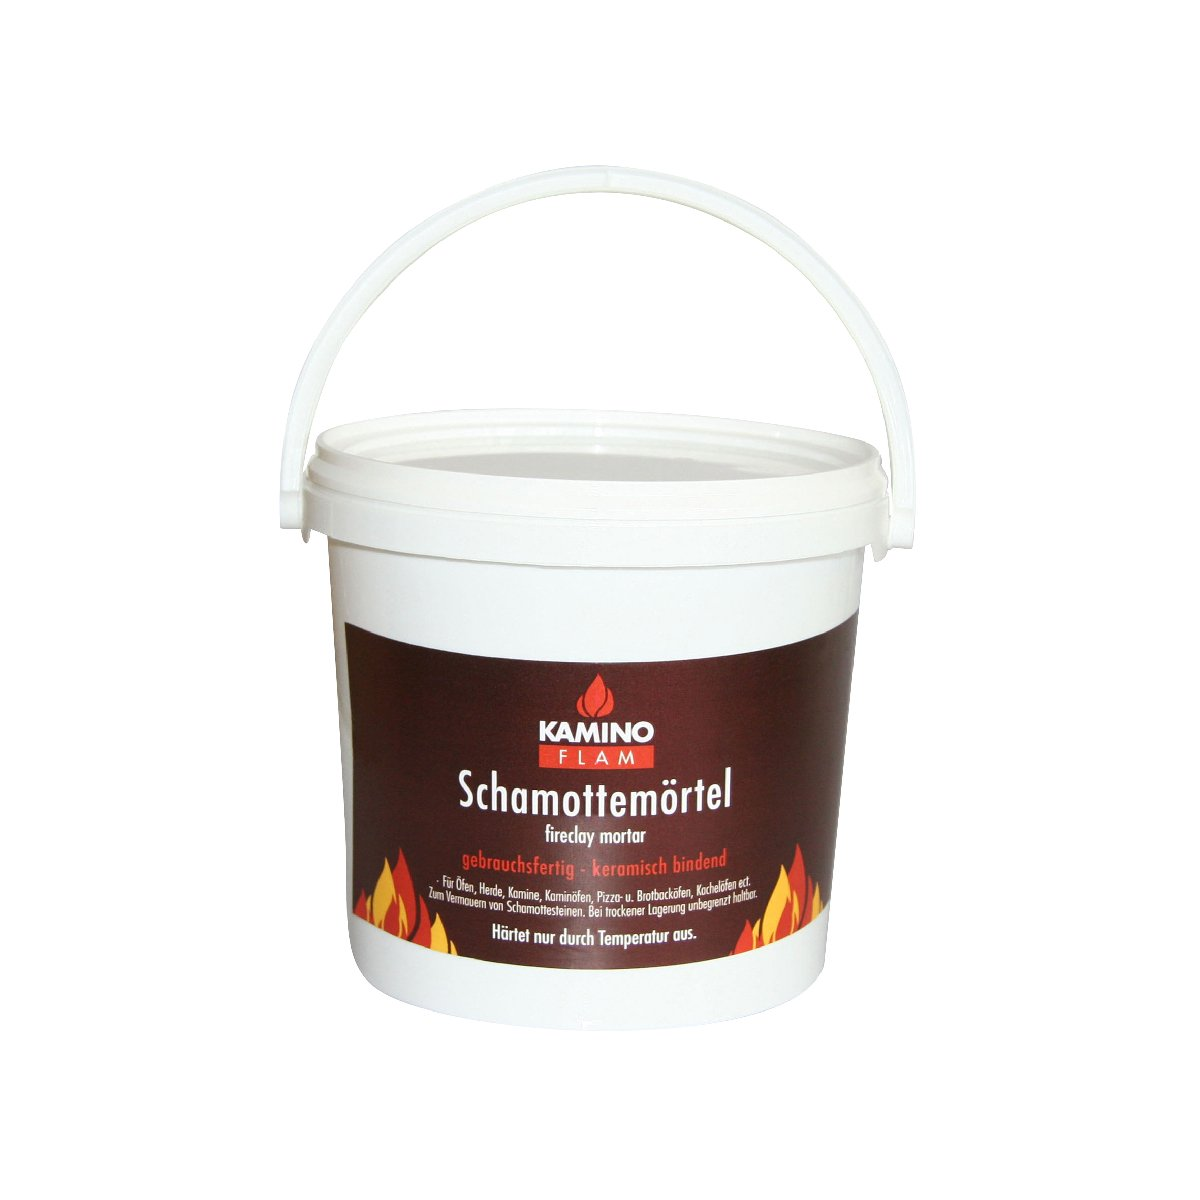 Kamino-Flam - Mortero refractario de chamota, Cemento refractario para chimeneas, barbacoas, estufas y hornos - resistente a altas temperaturas - 1 kg: ...